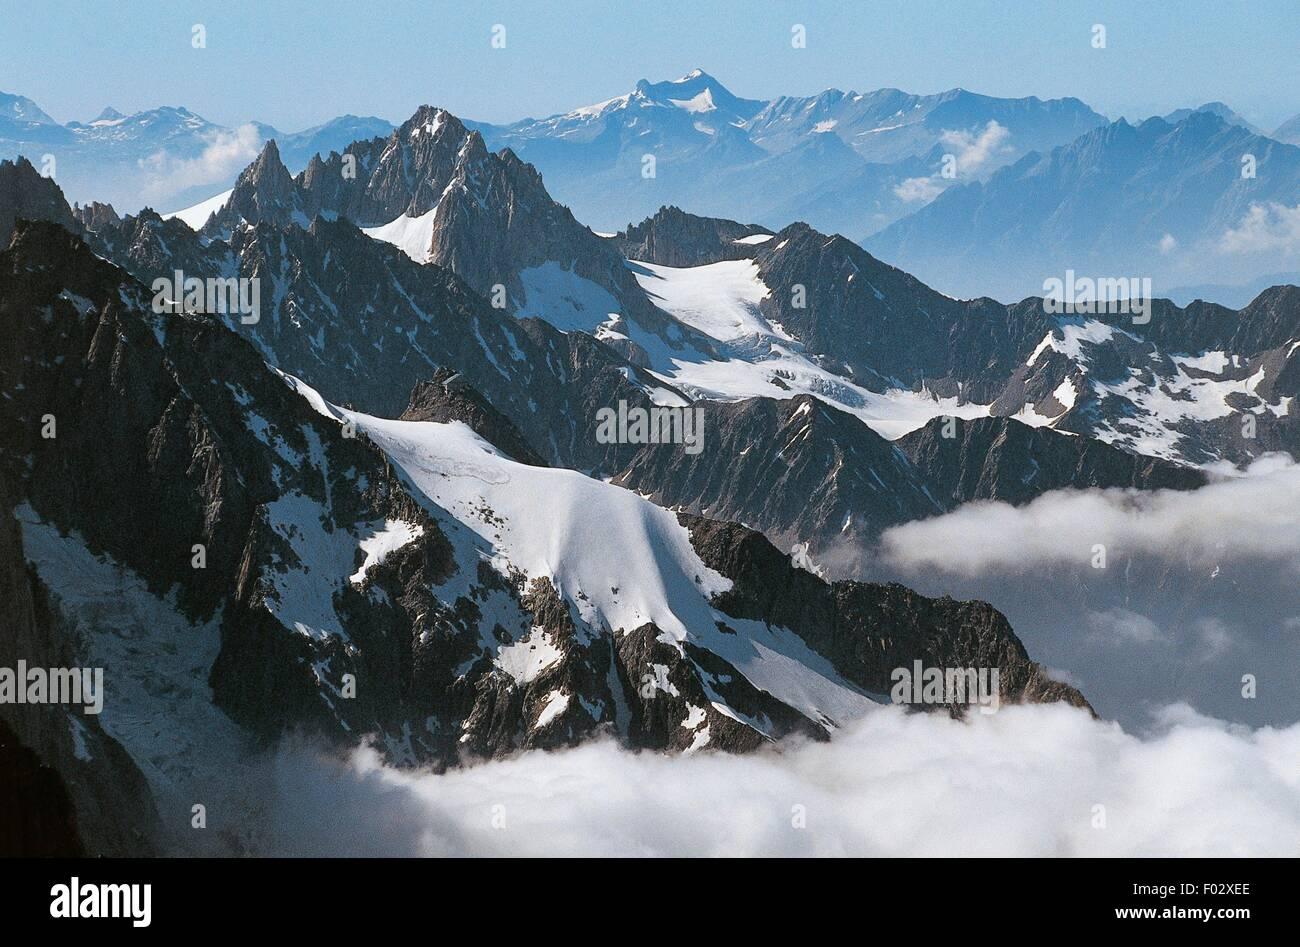 Aiguille Du Midi Mountain Highest Point 3842 M Of The